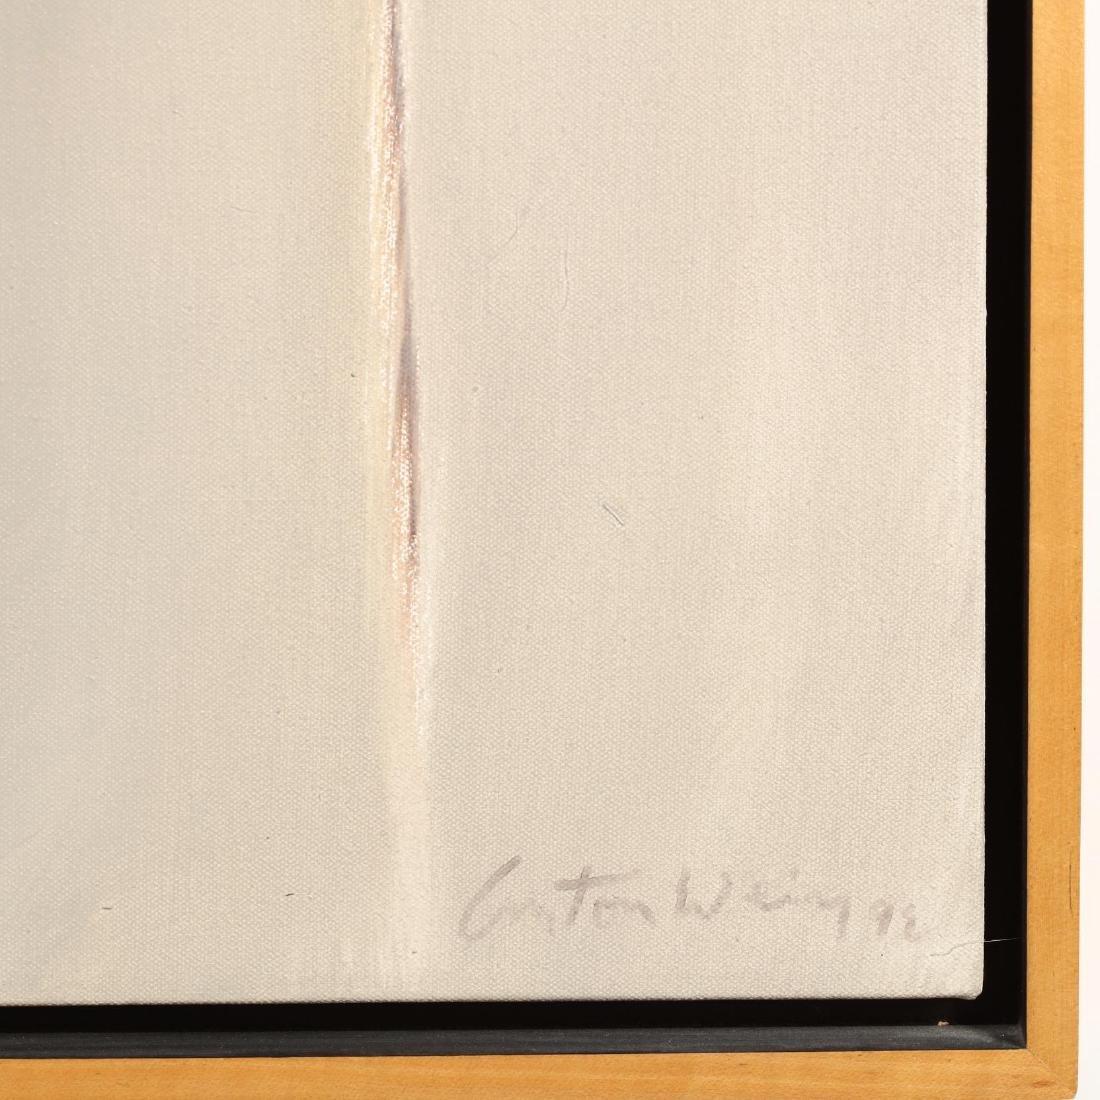 Anton Weiss (TN, b. 1936), Untitled - 2